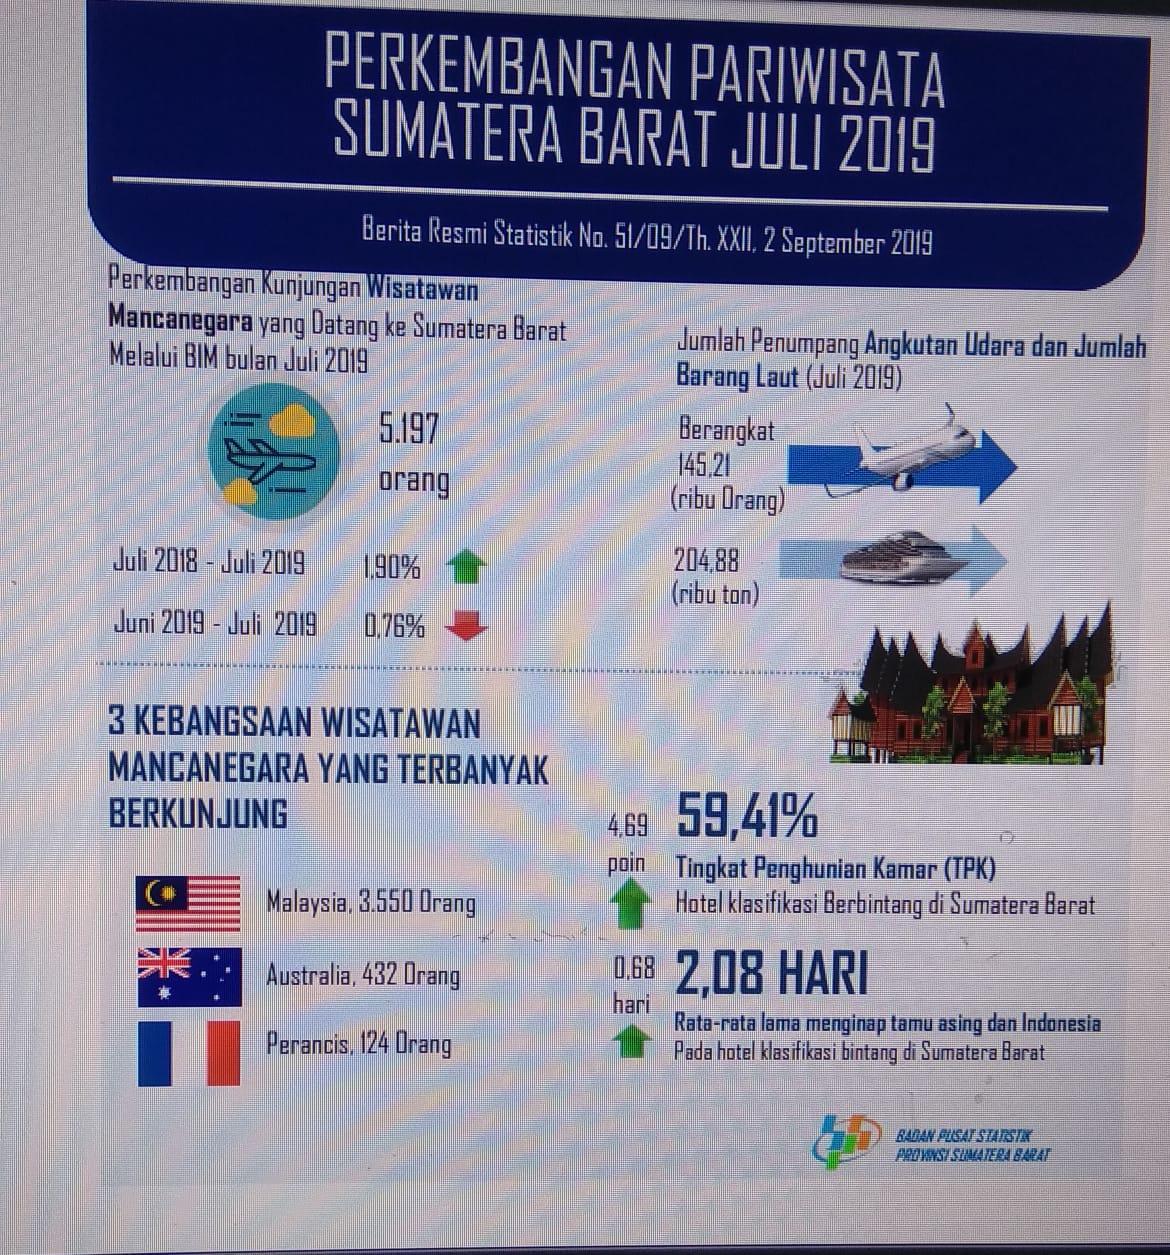 Perkembangan Pariwisata dan Transportasi Sumatera Barat Juli 2019